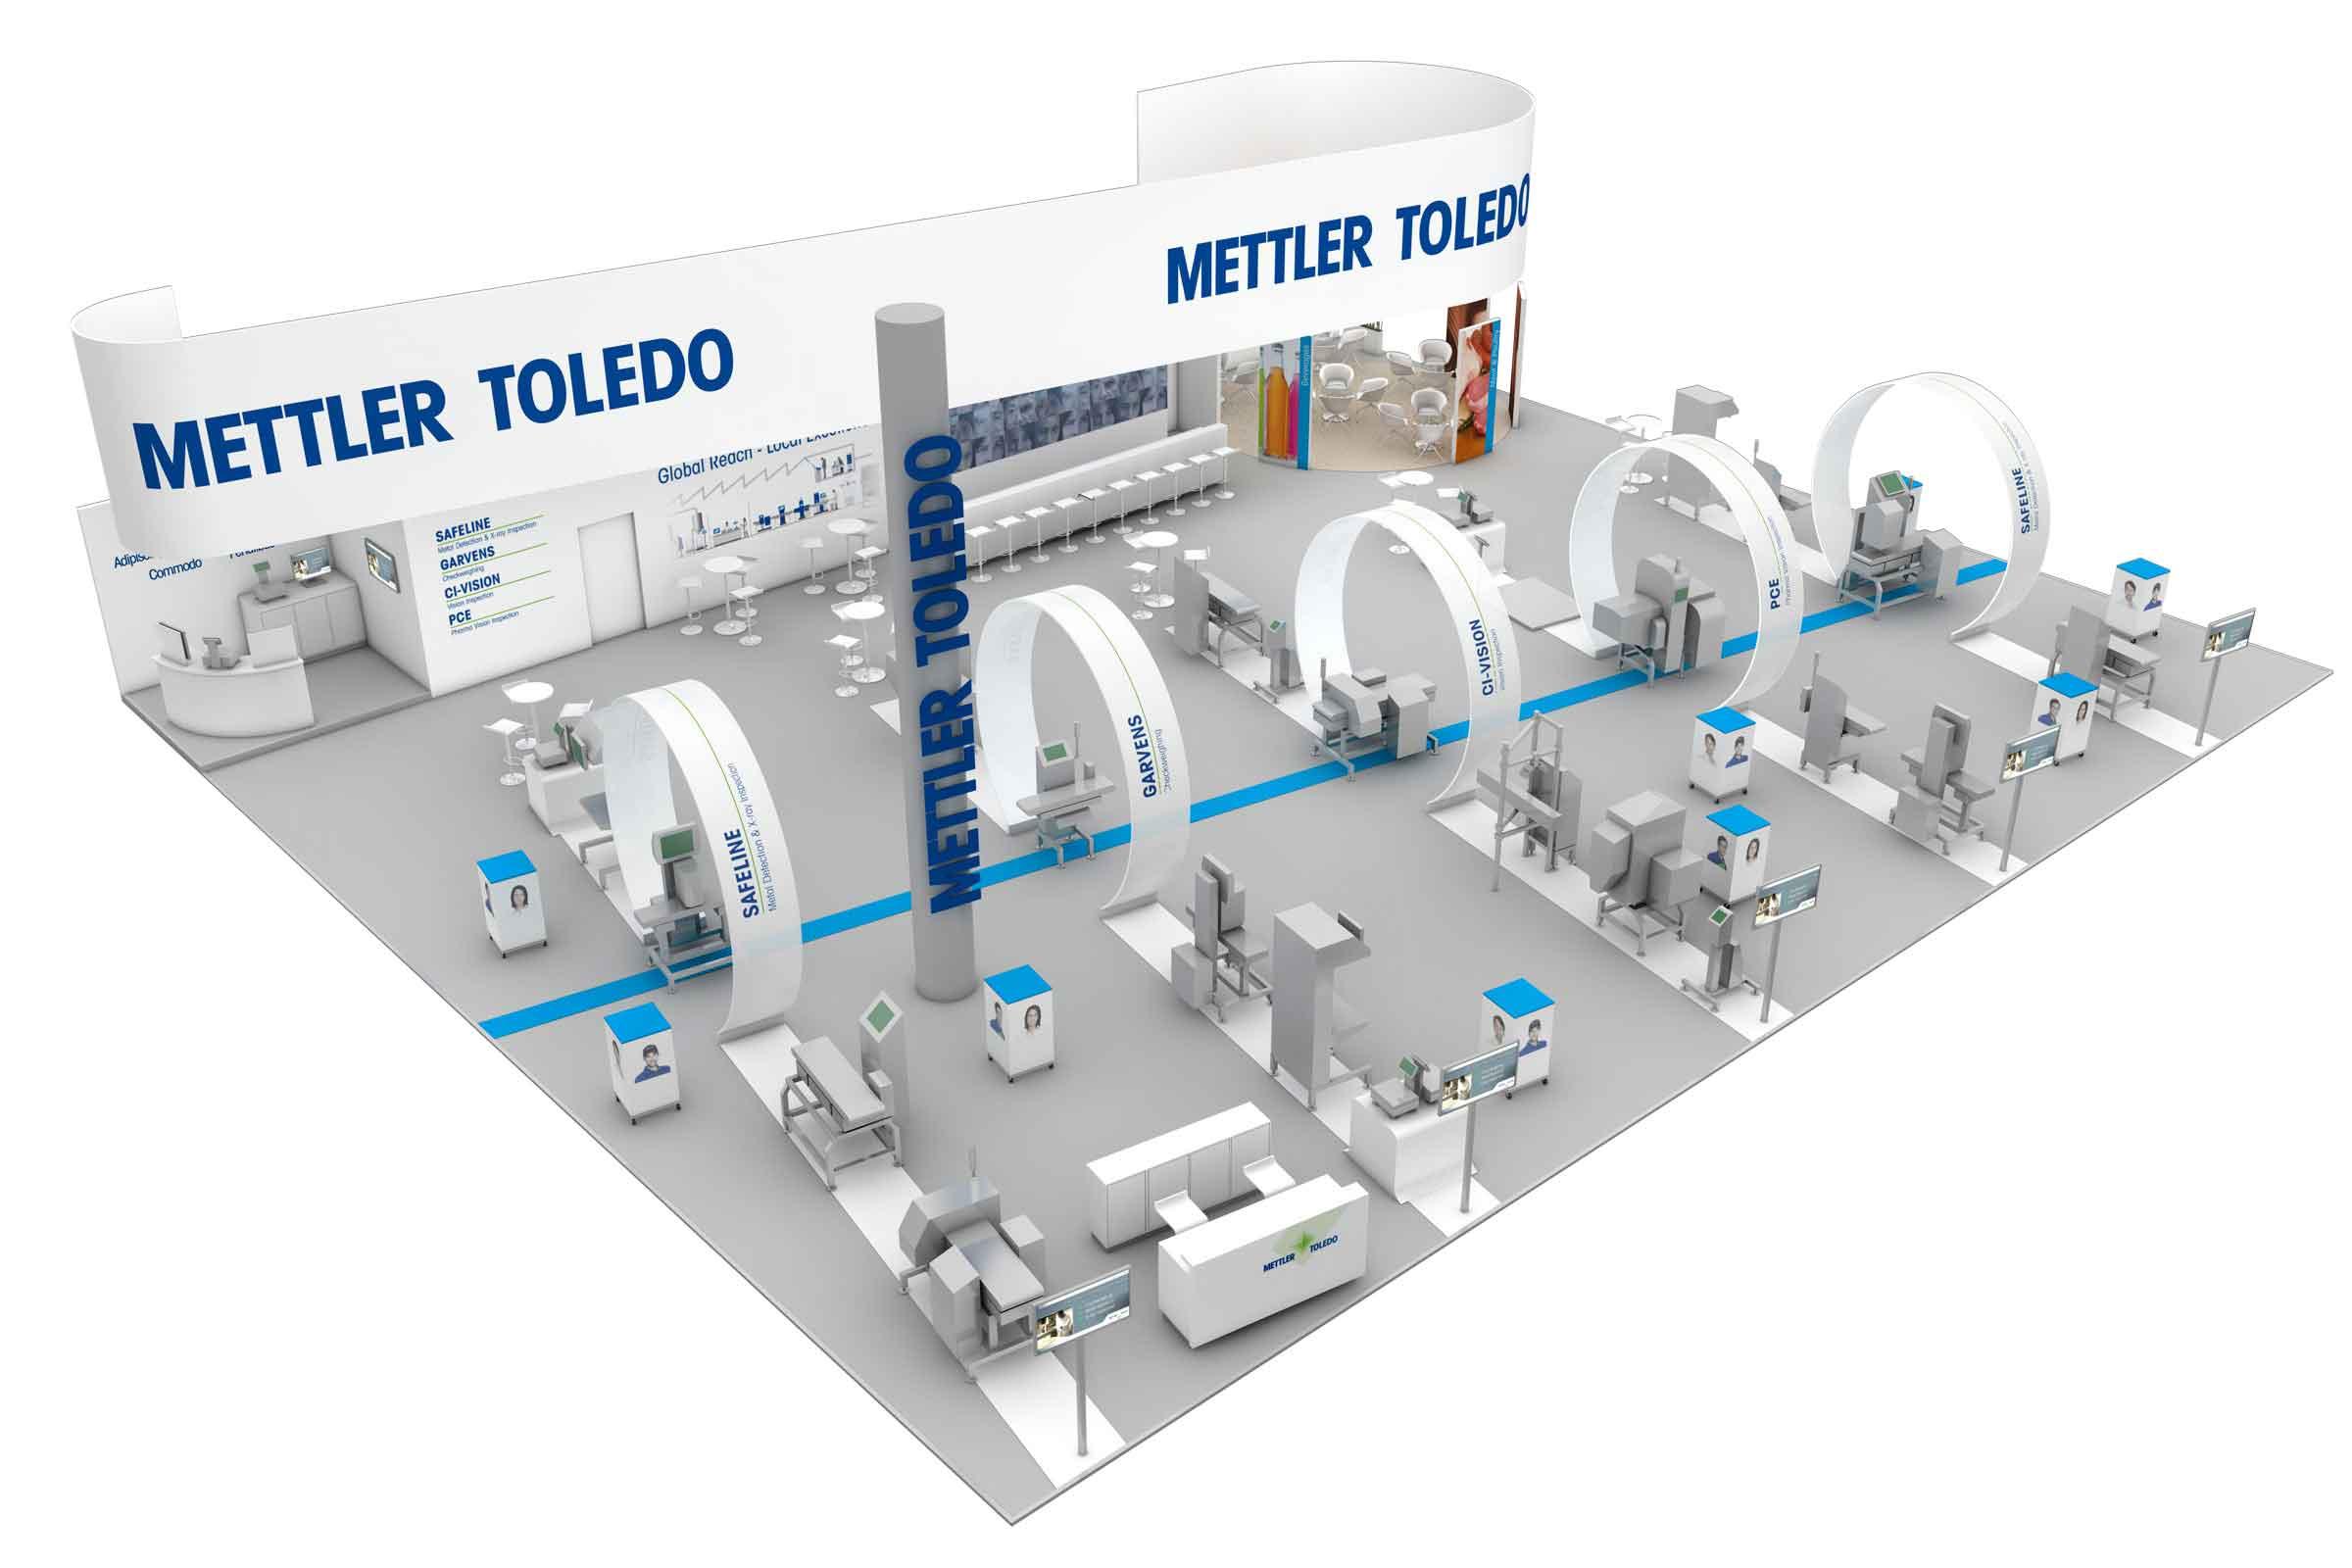 Invitation to meet Mettler-Toledo at interpack 2014